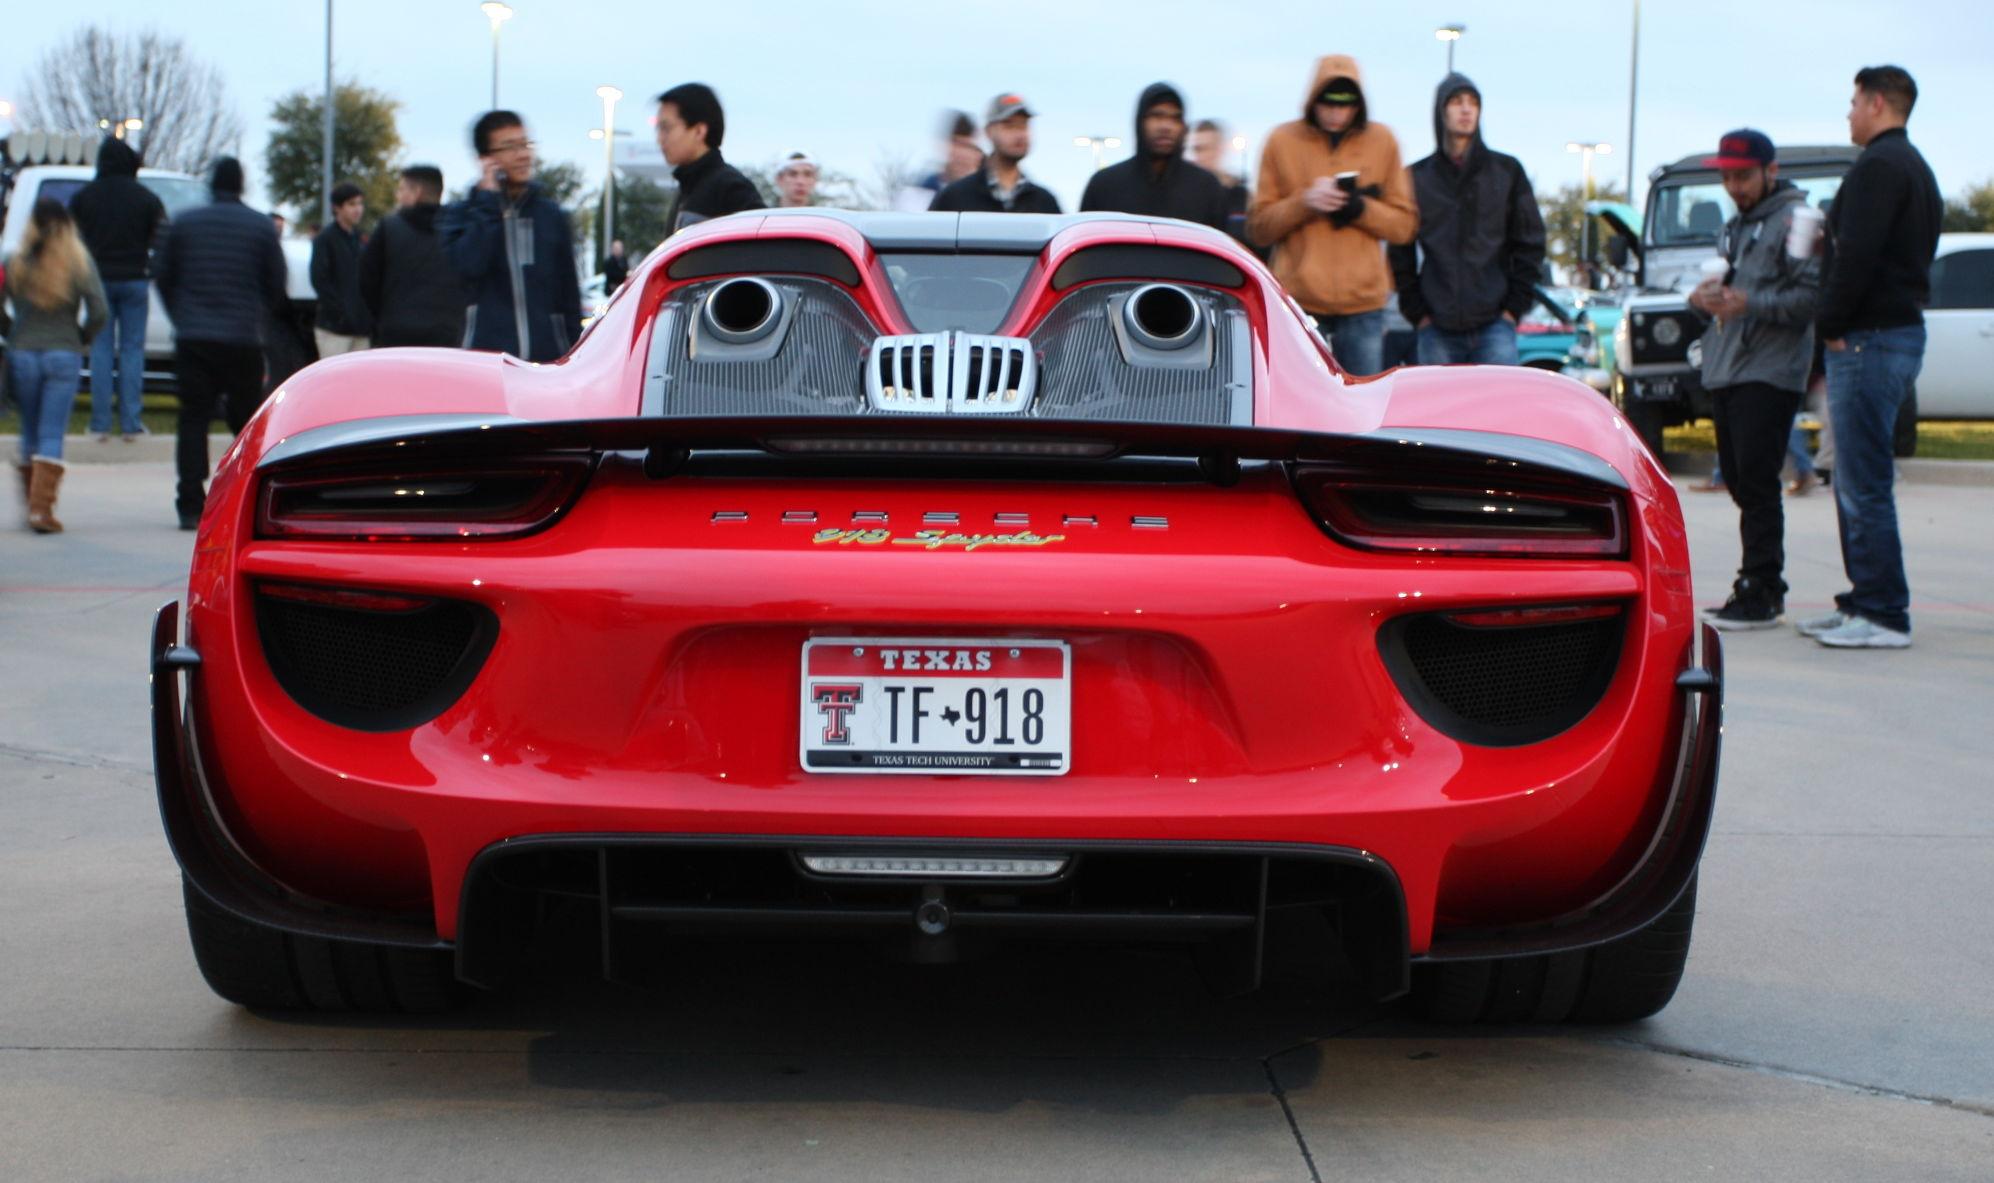 Plano Texas Cars And Coffee Jaguar Forums Jaguar Enthusiasts Forum - Plano car show